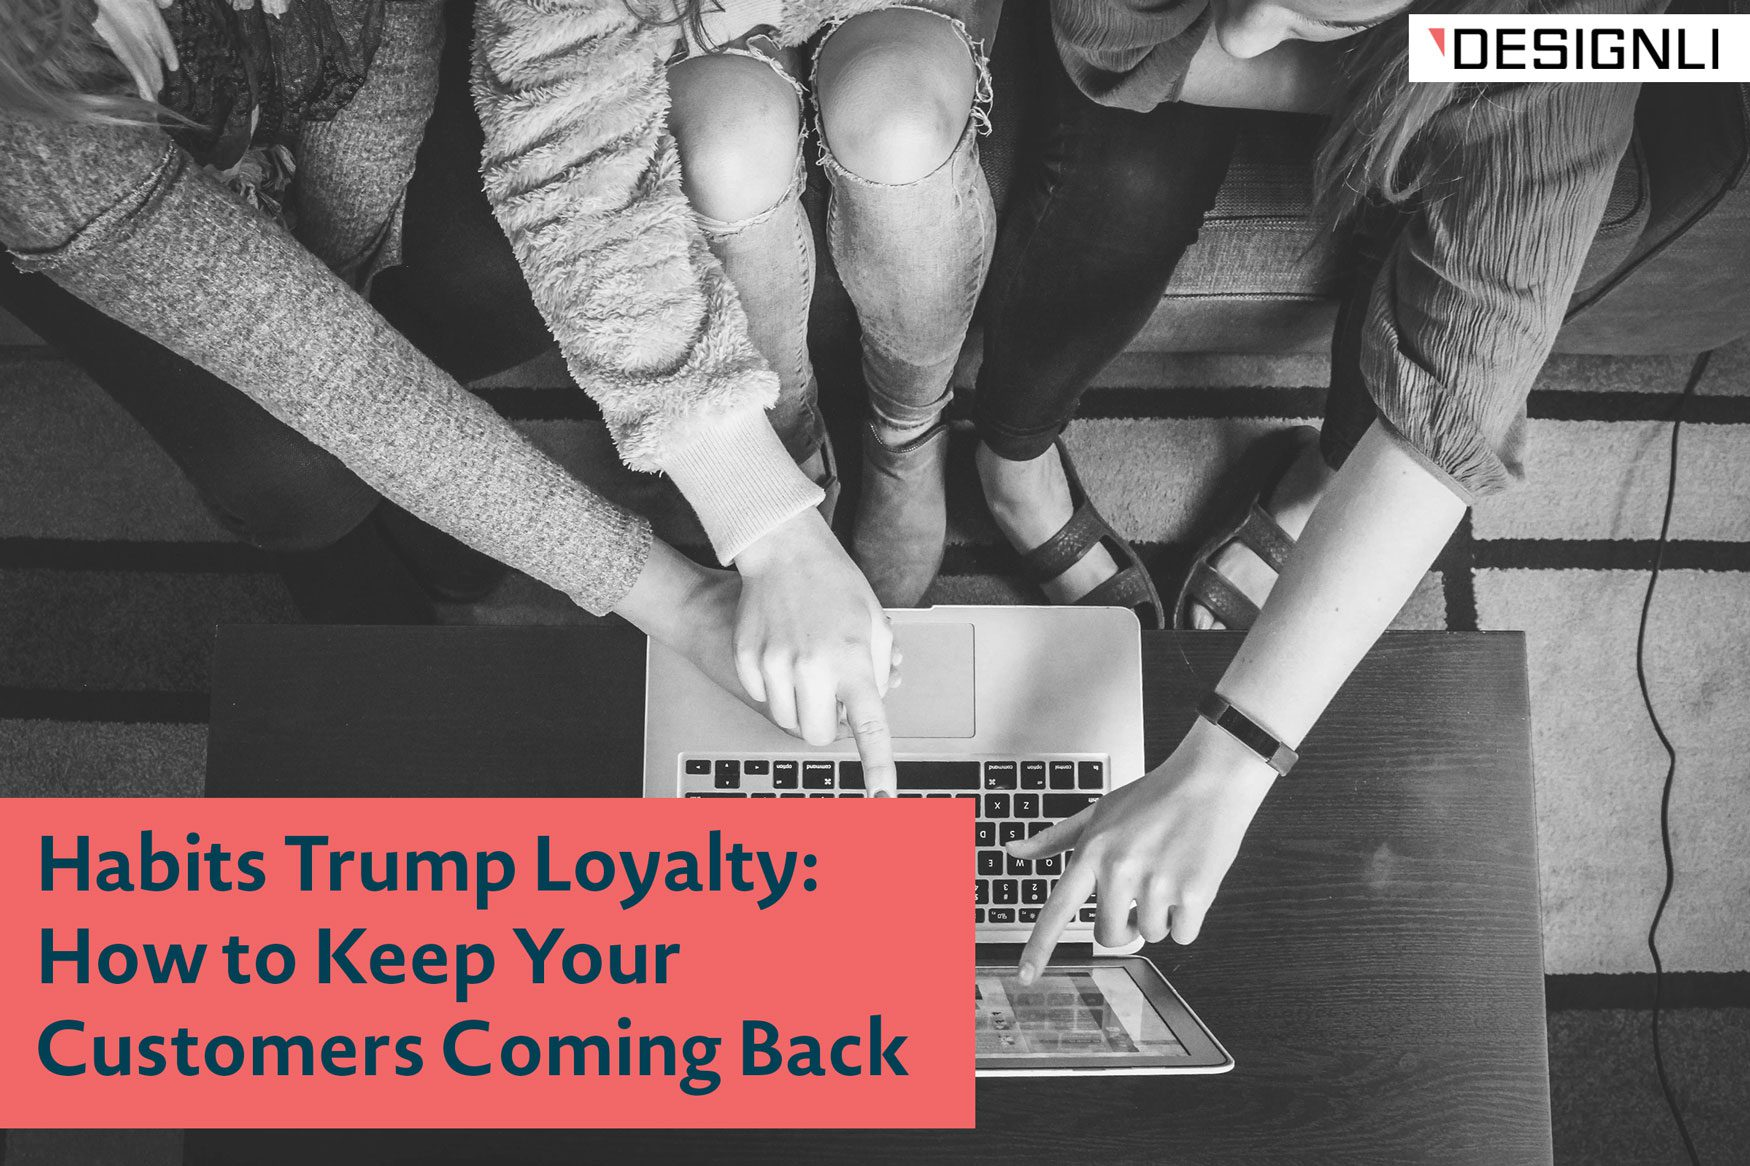 keep customers coming back